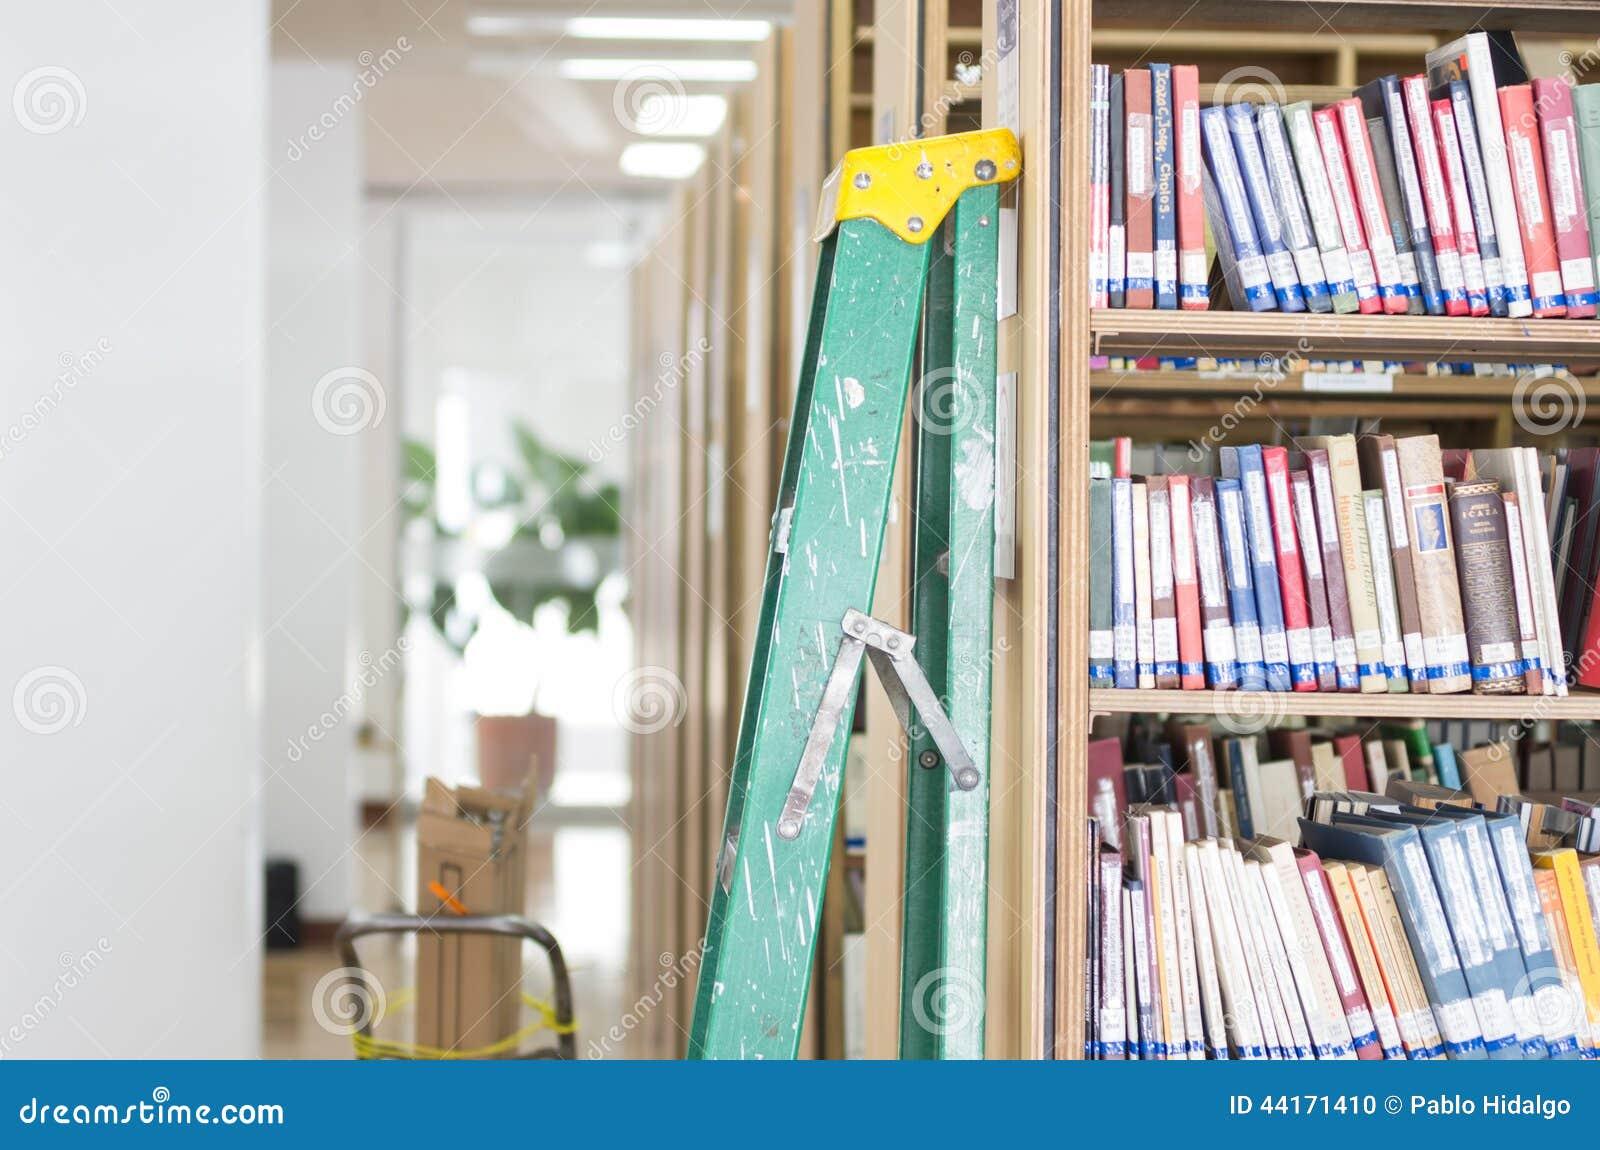 Ladder against a bookshelf in publc school college library. 1300 x 951